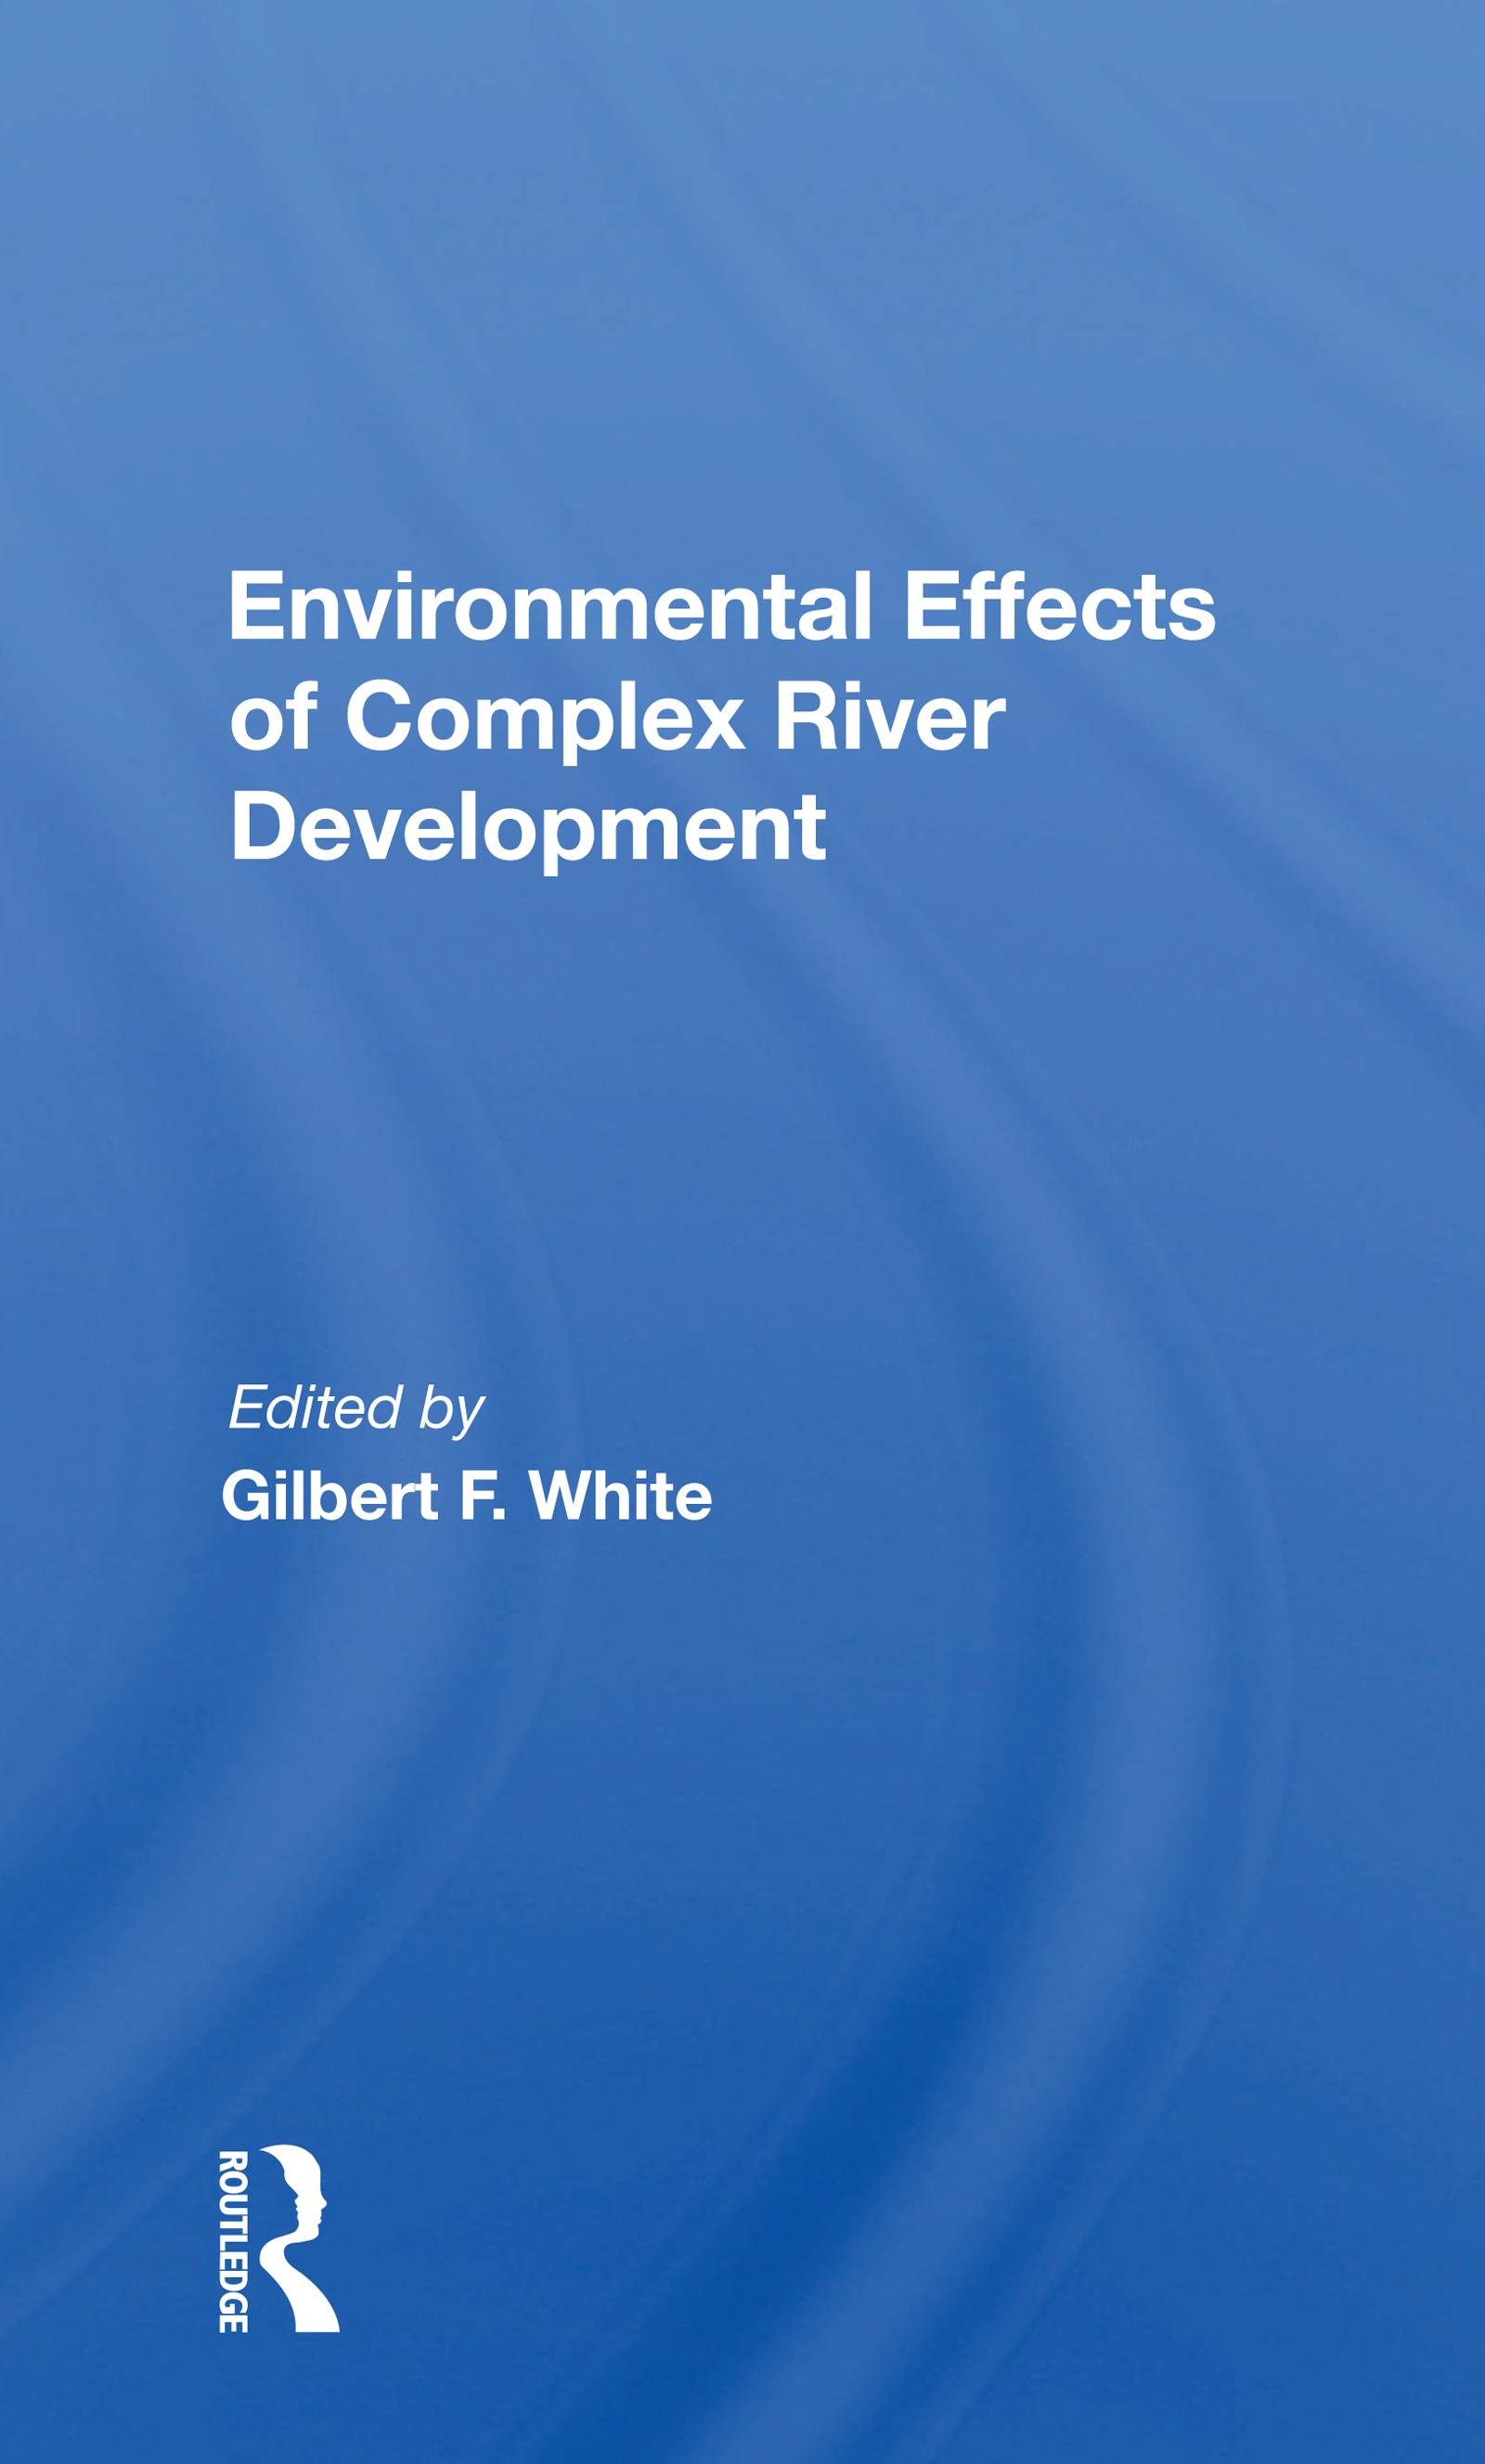 Environmental Effects of Complex River Development